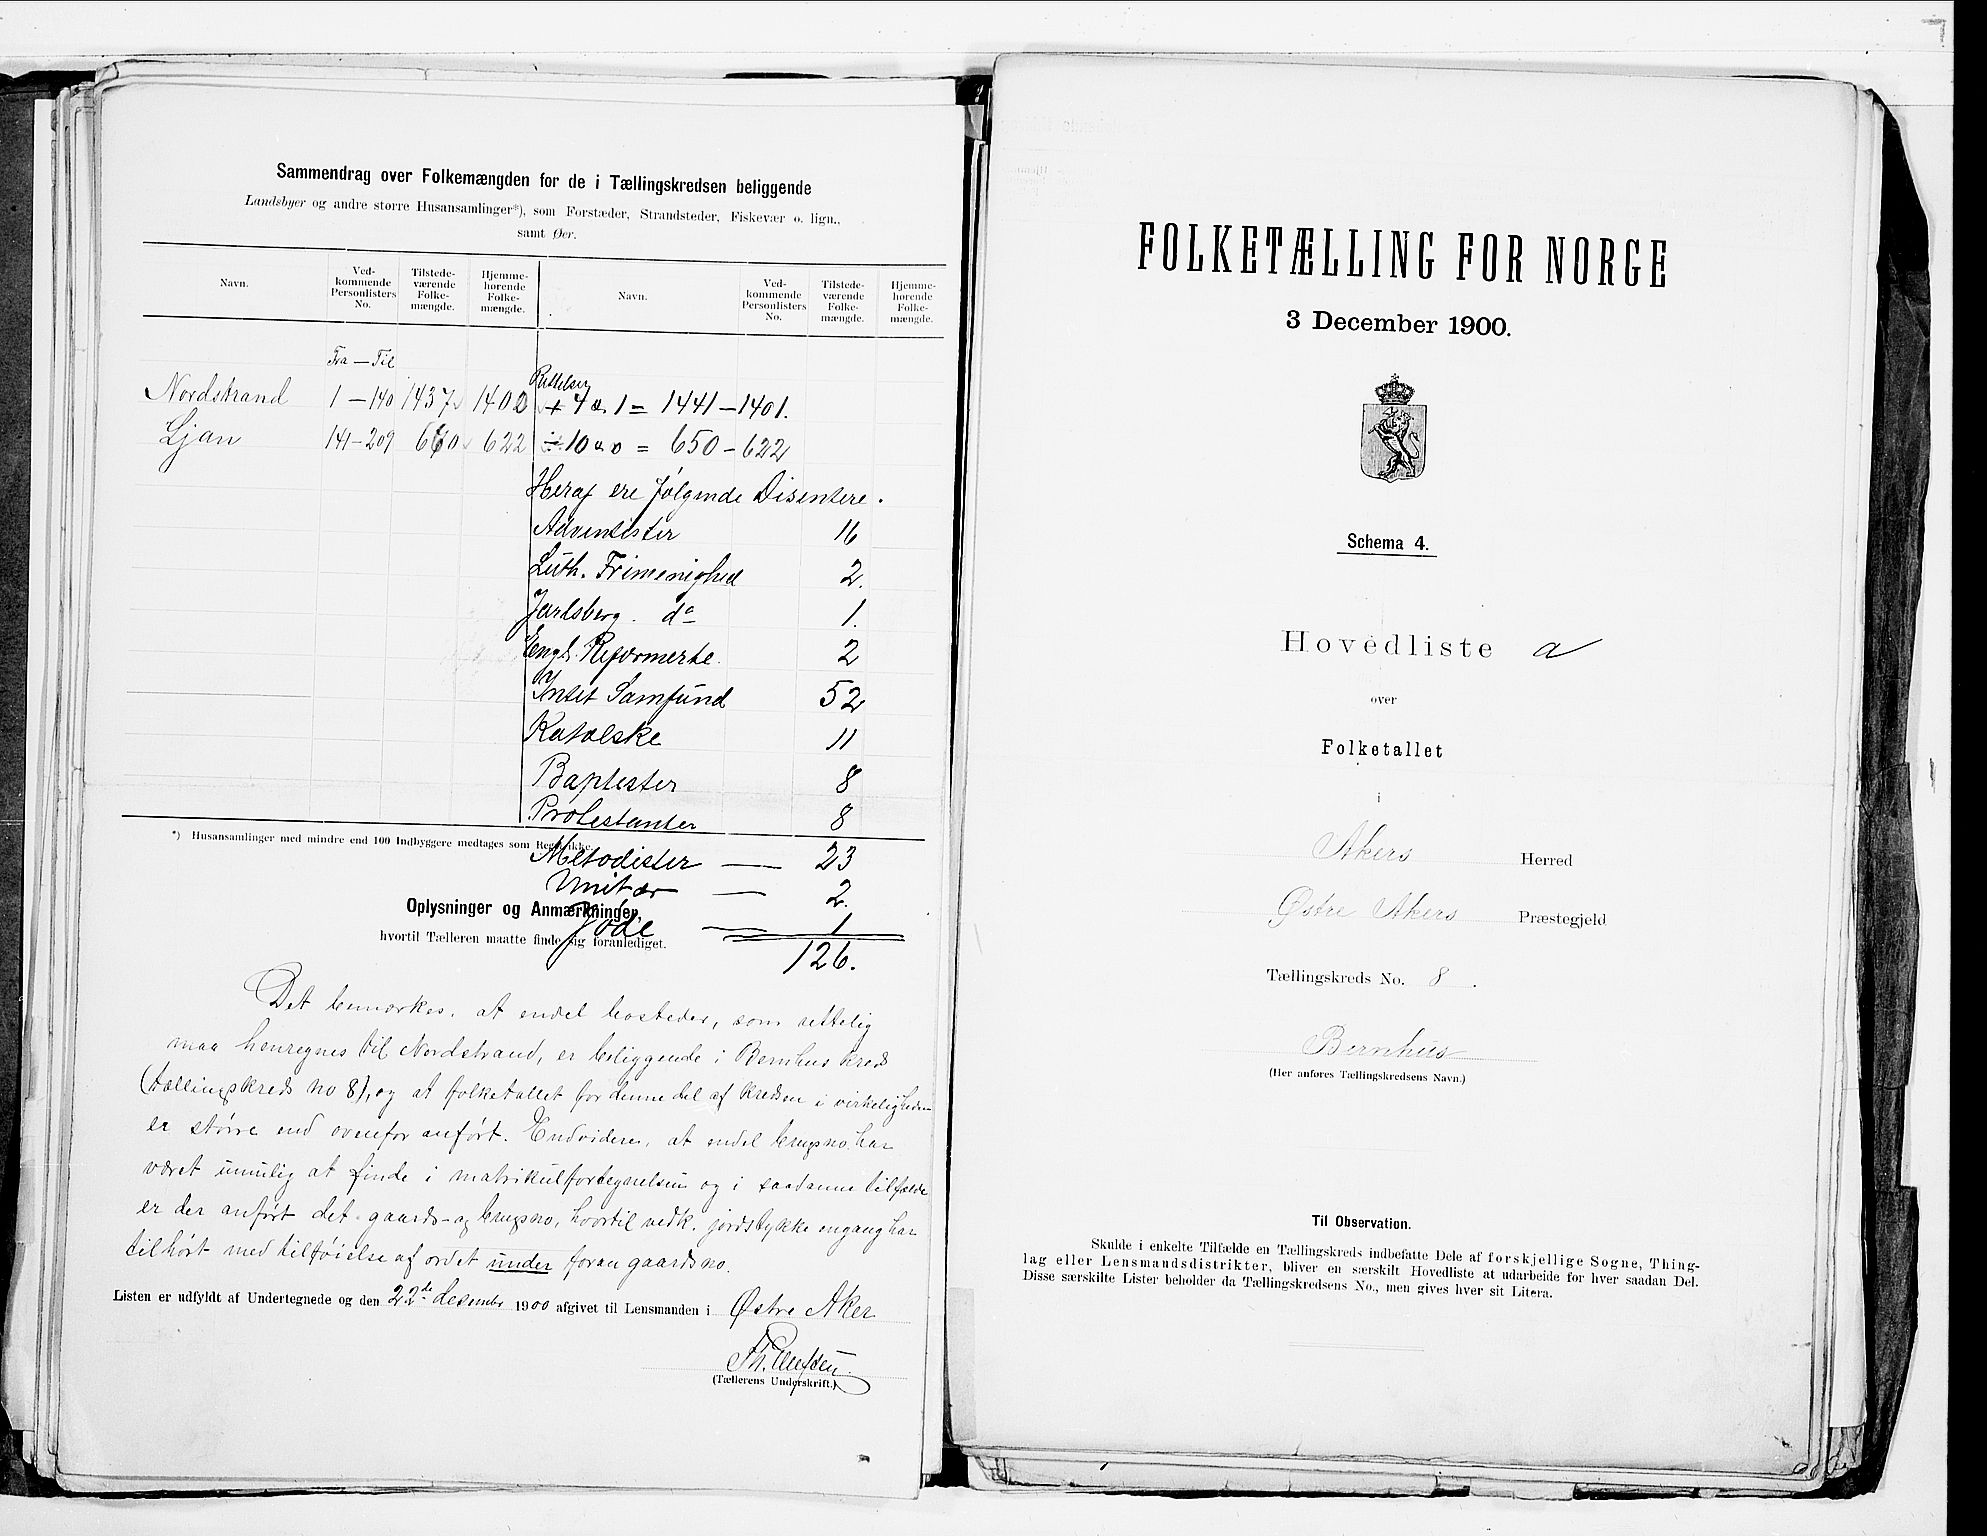 SAO, 1900 census for Aker, 1900, p. 31